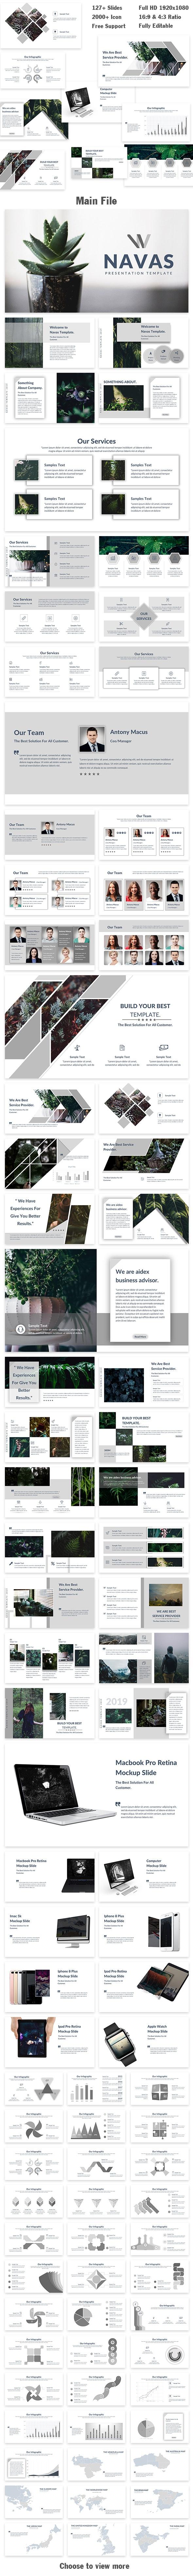 Navas Creative Google Slide Template - Google Slides Presentation Templates